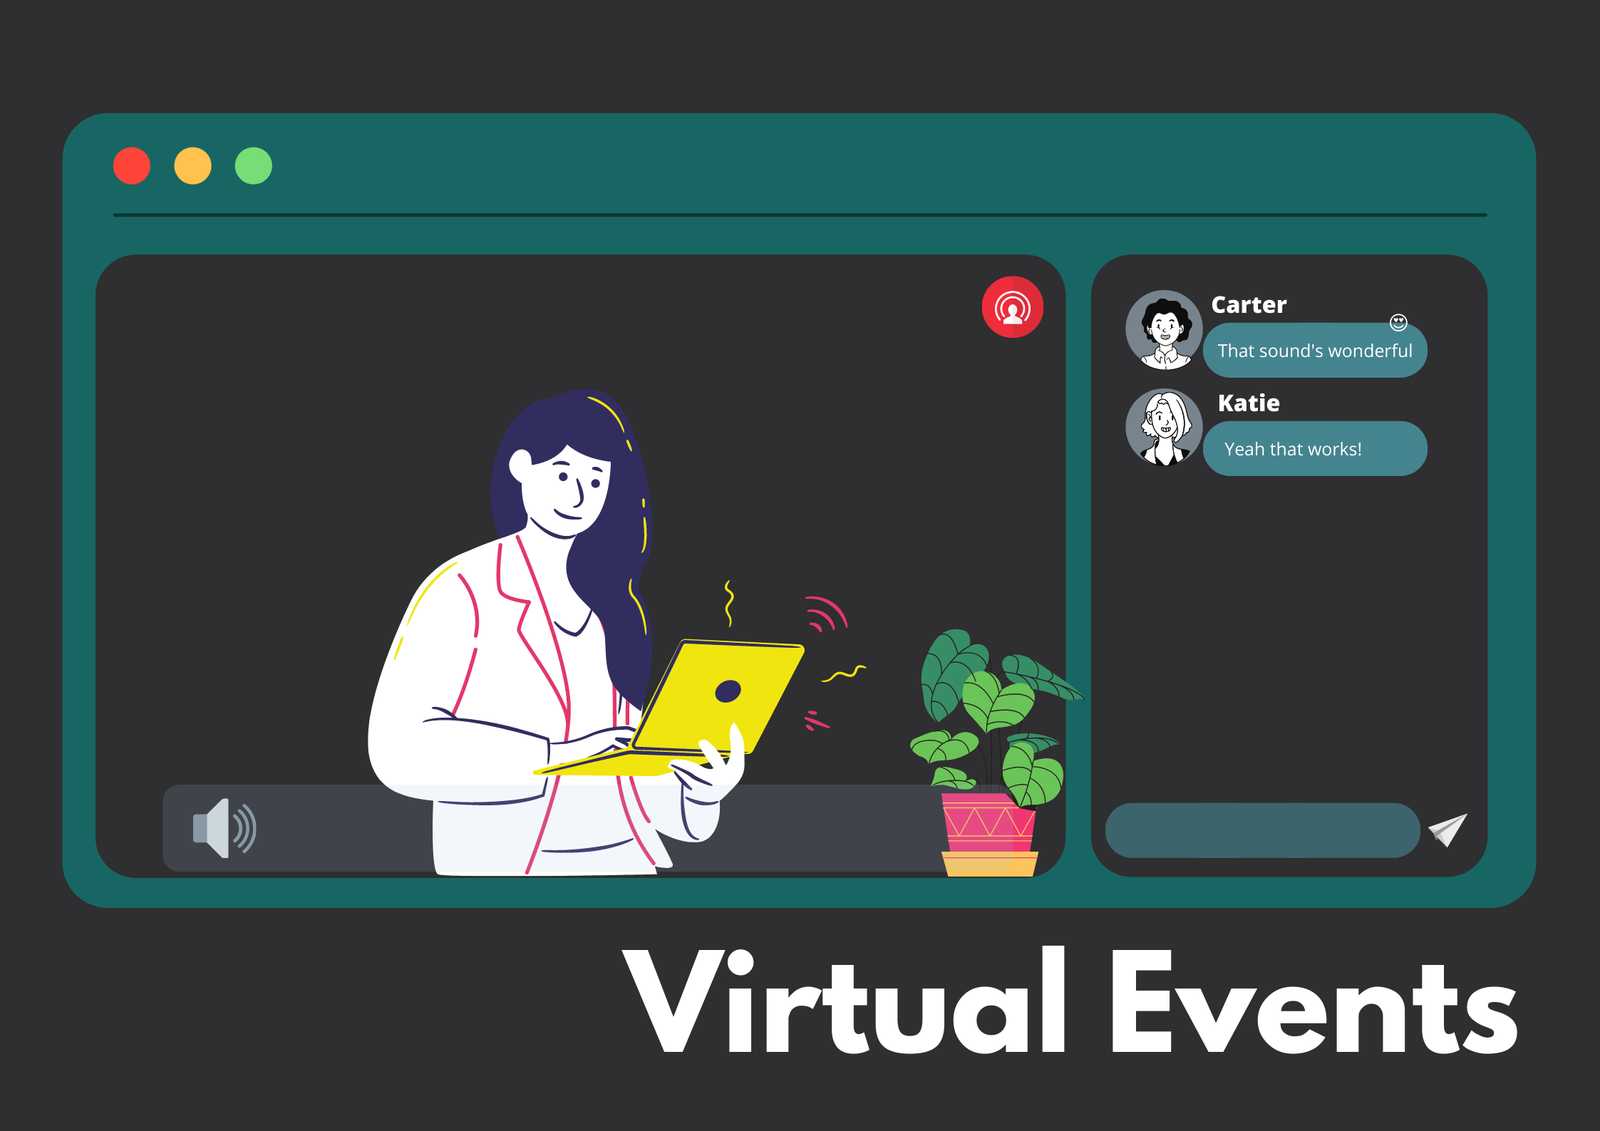 Screenshot of an on-going virtual event